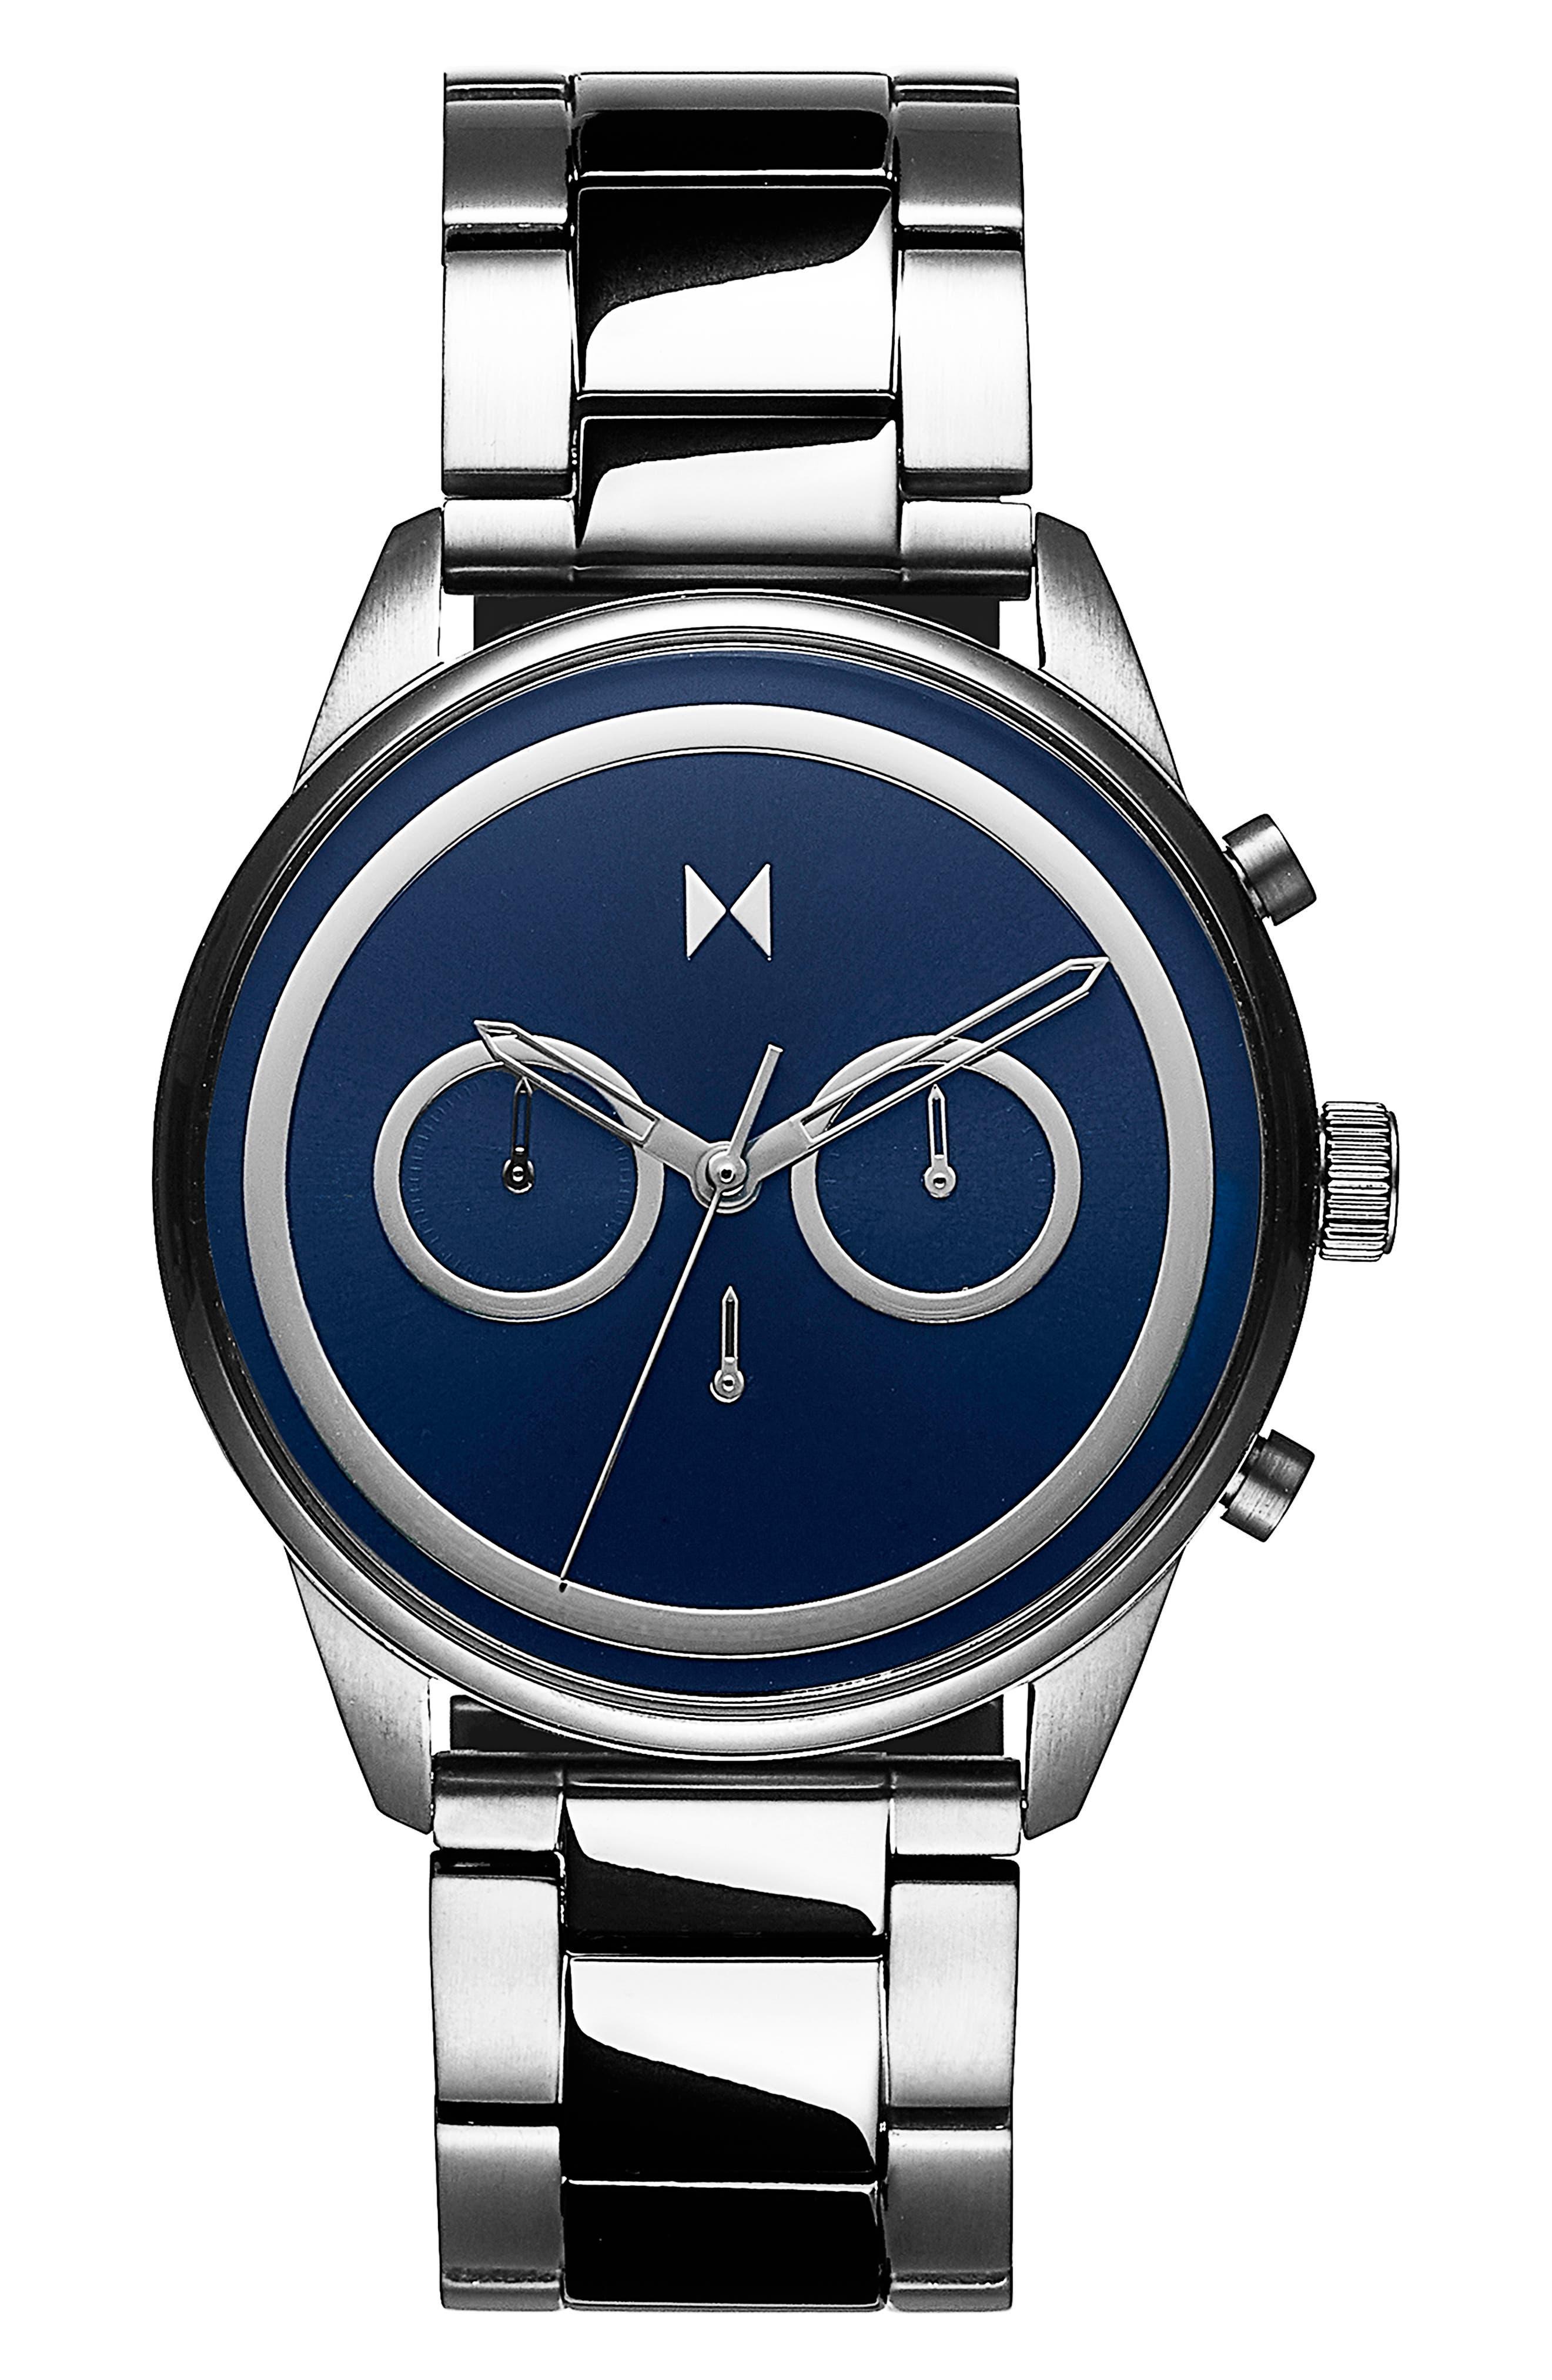 Powerlane Chronograph Bracelet Watch